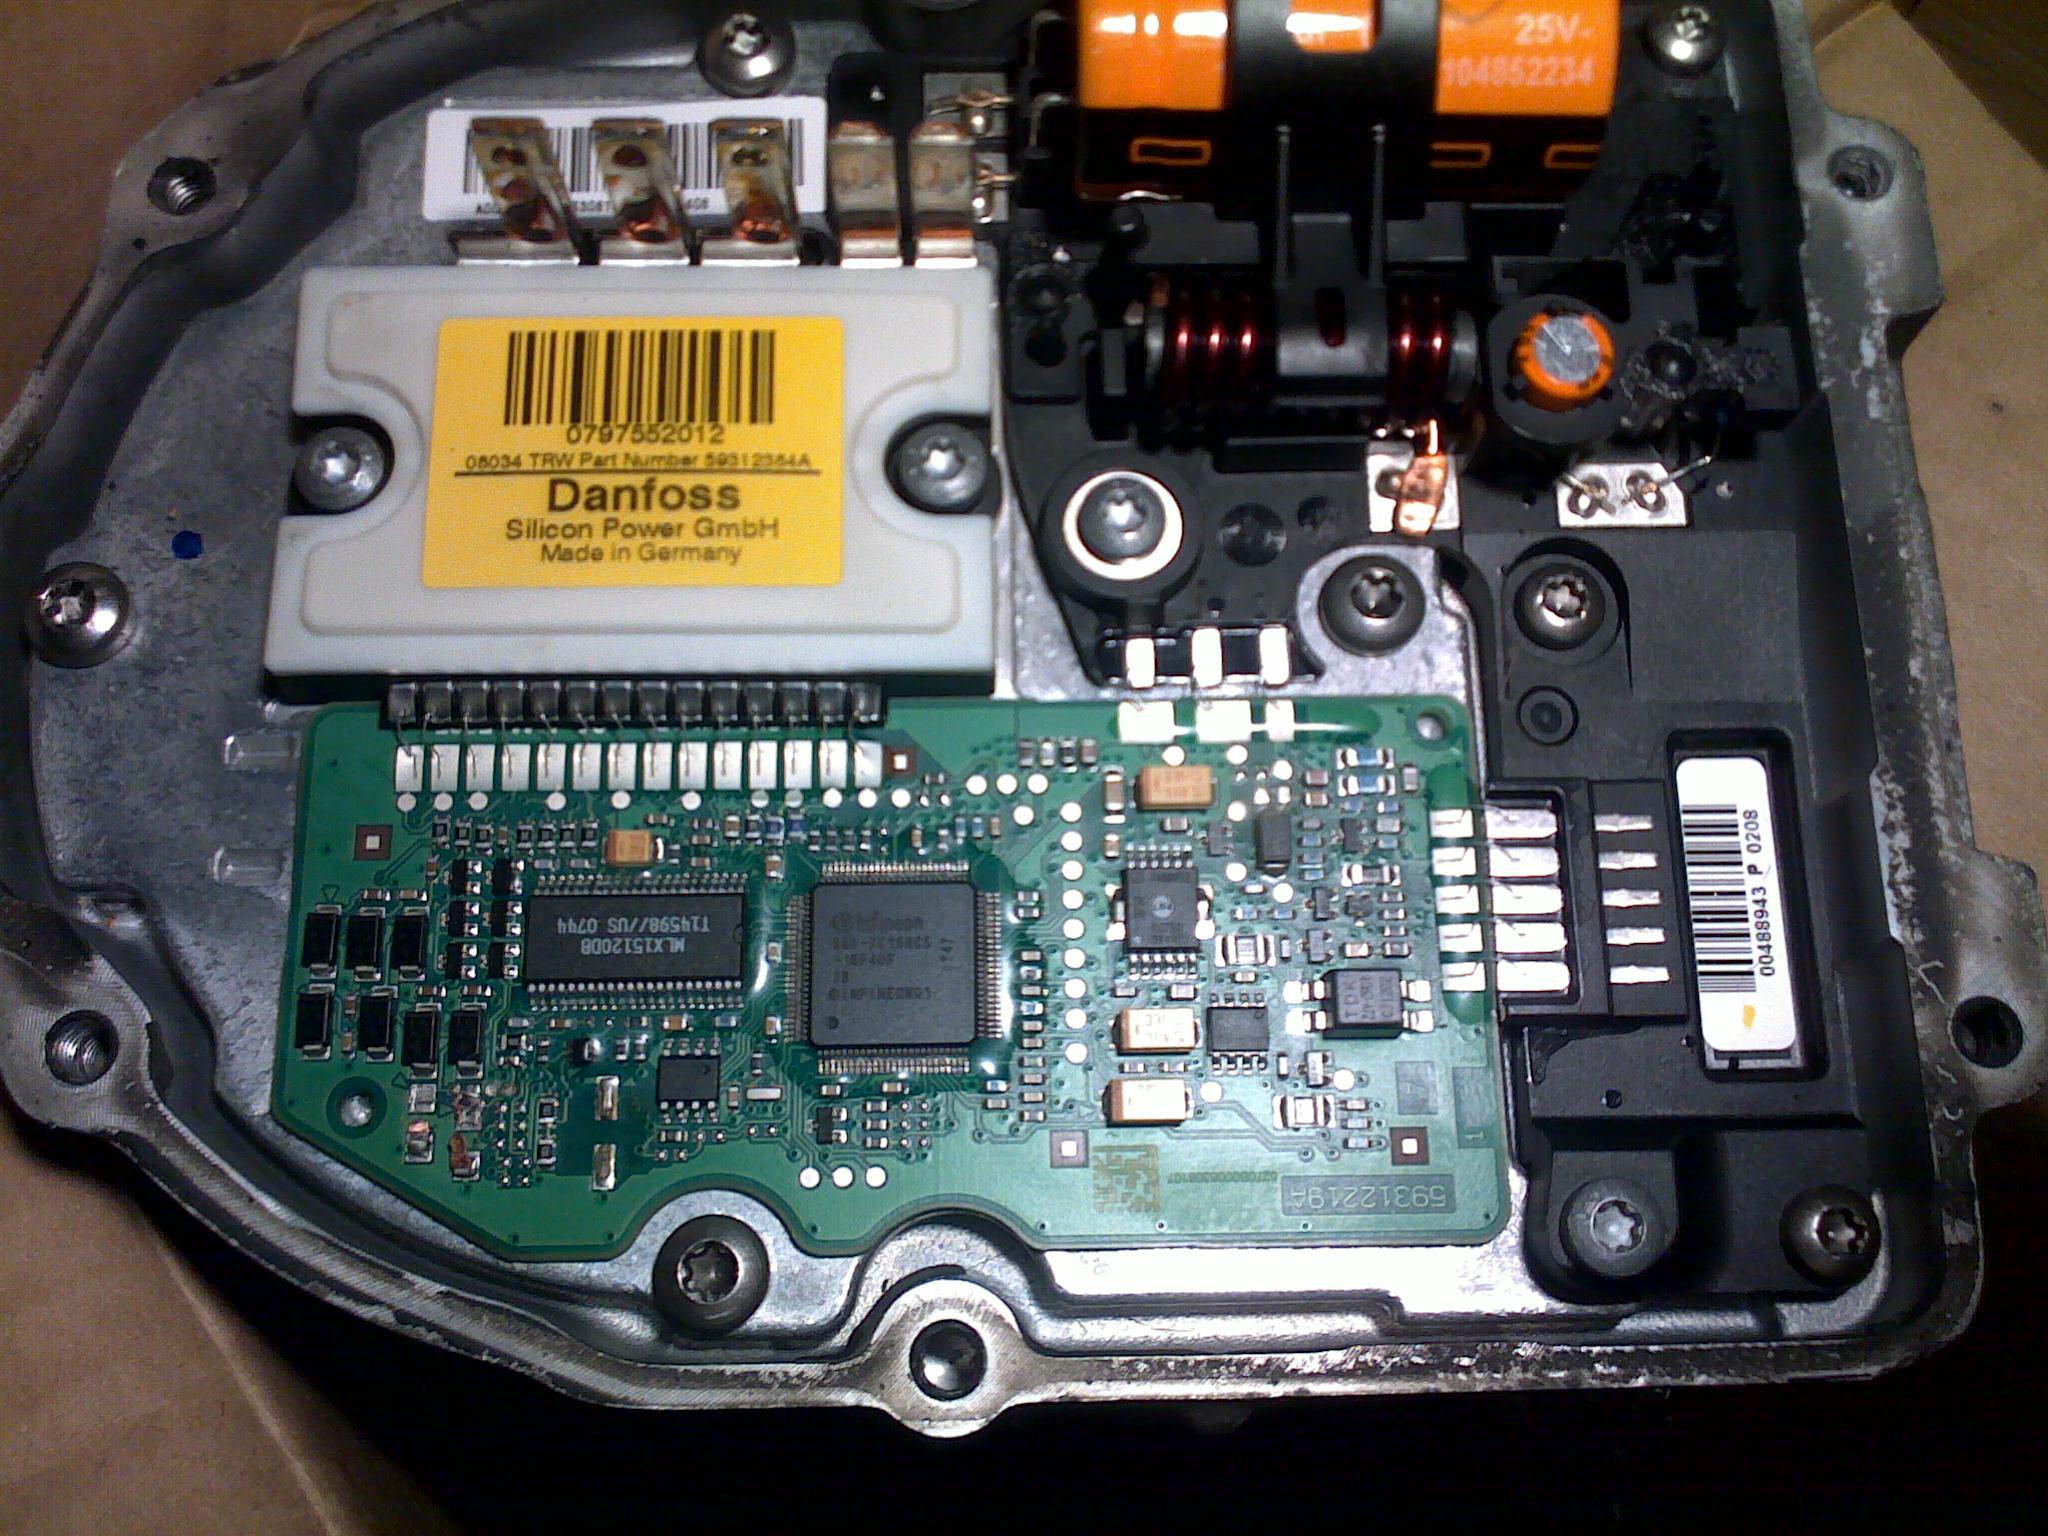 Sterownik pompy wspomagania Peugeot 307 (Danfoss) - brak kilku element�w